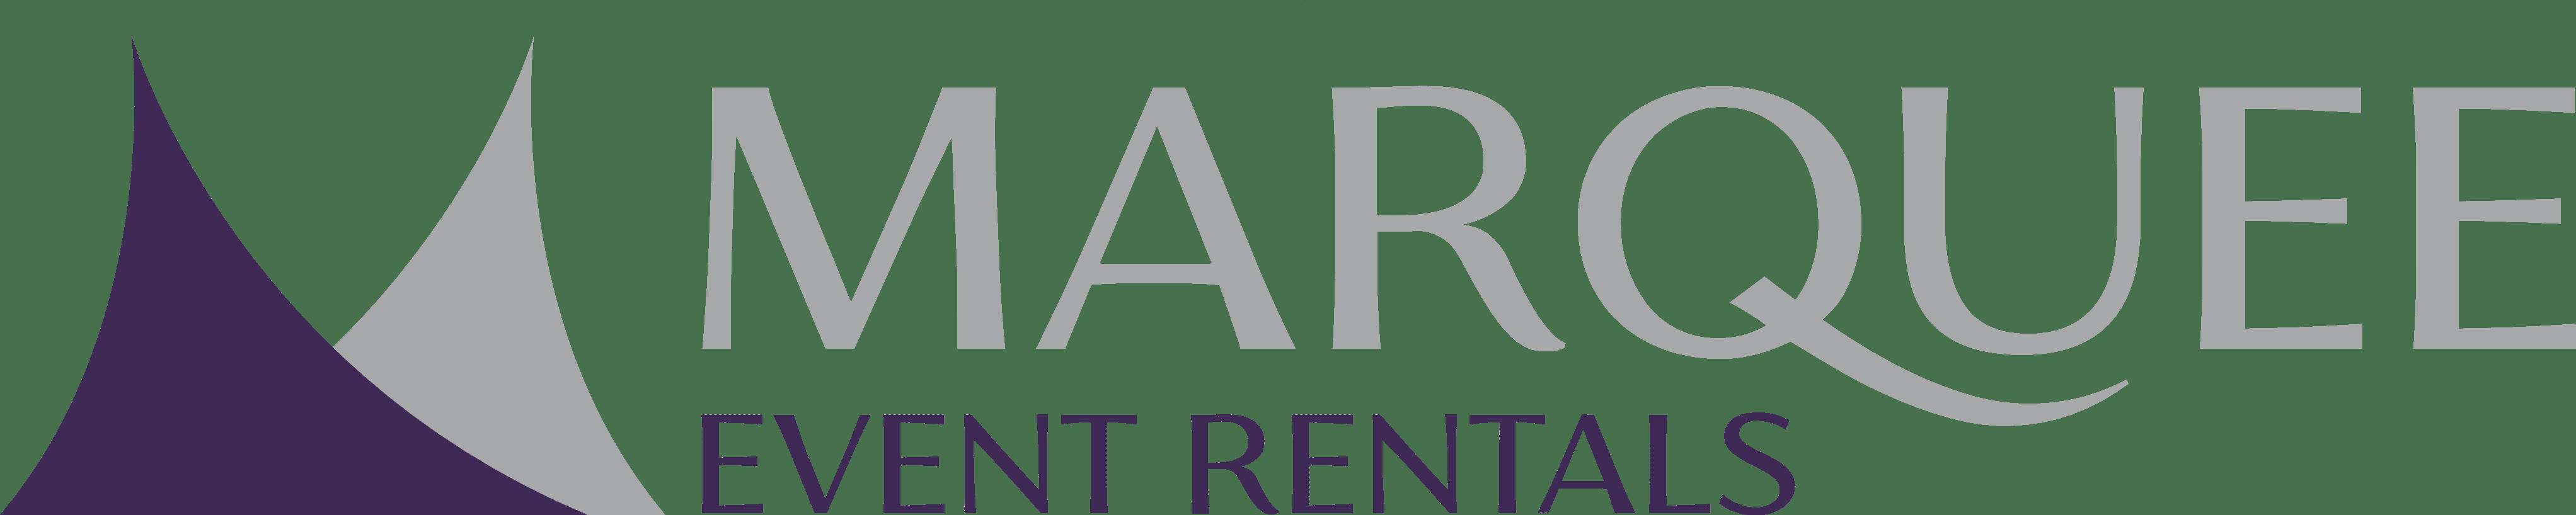 Marquee Event Rentals